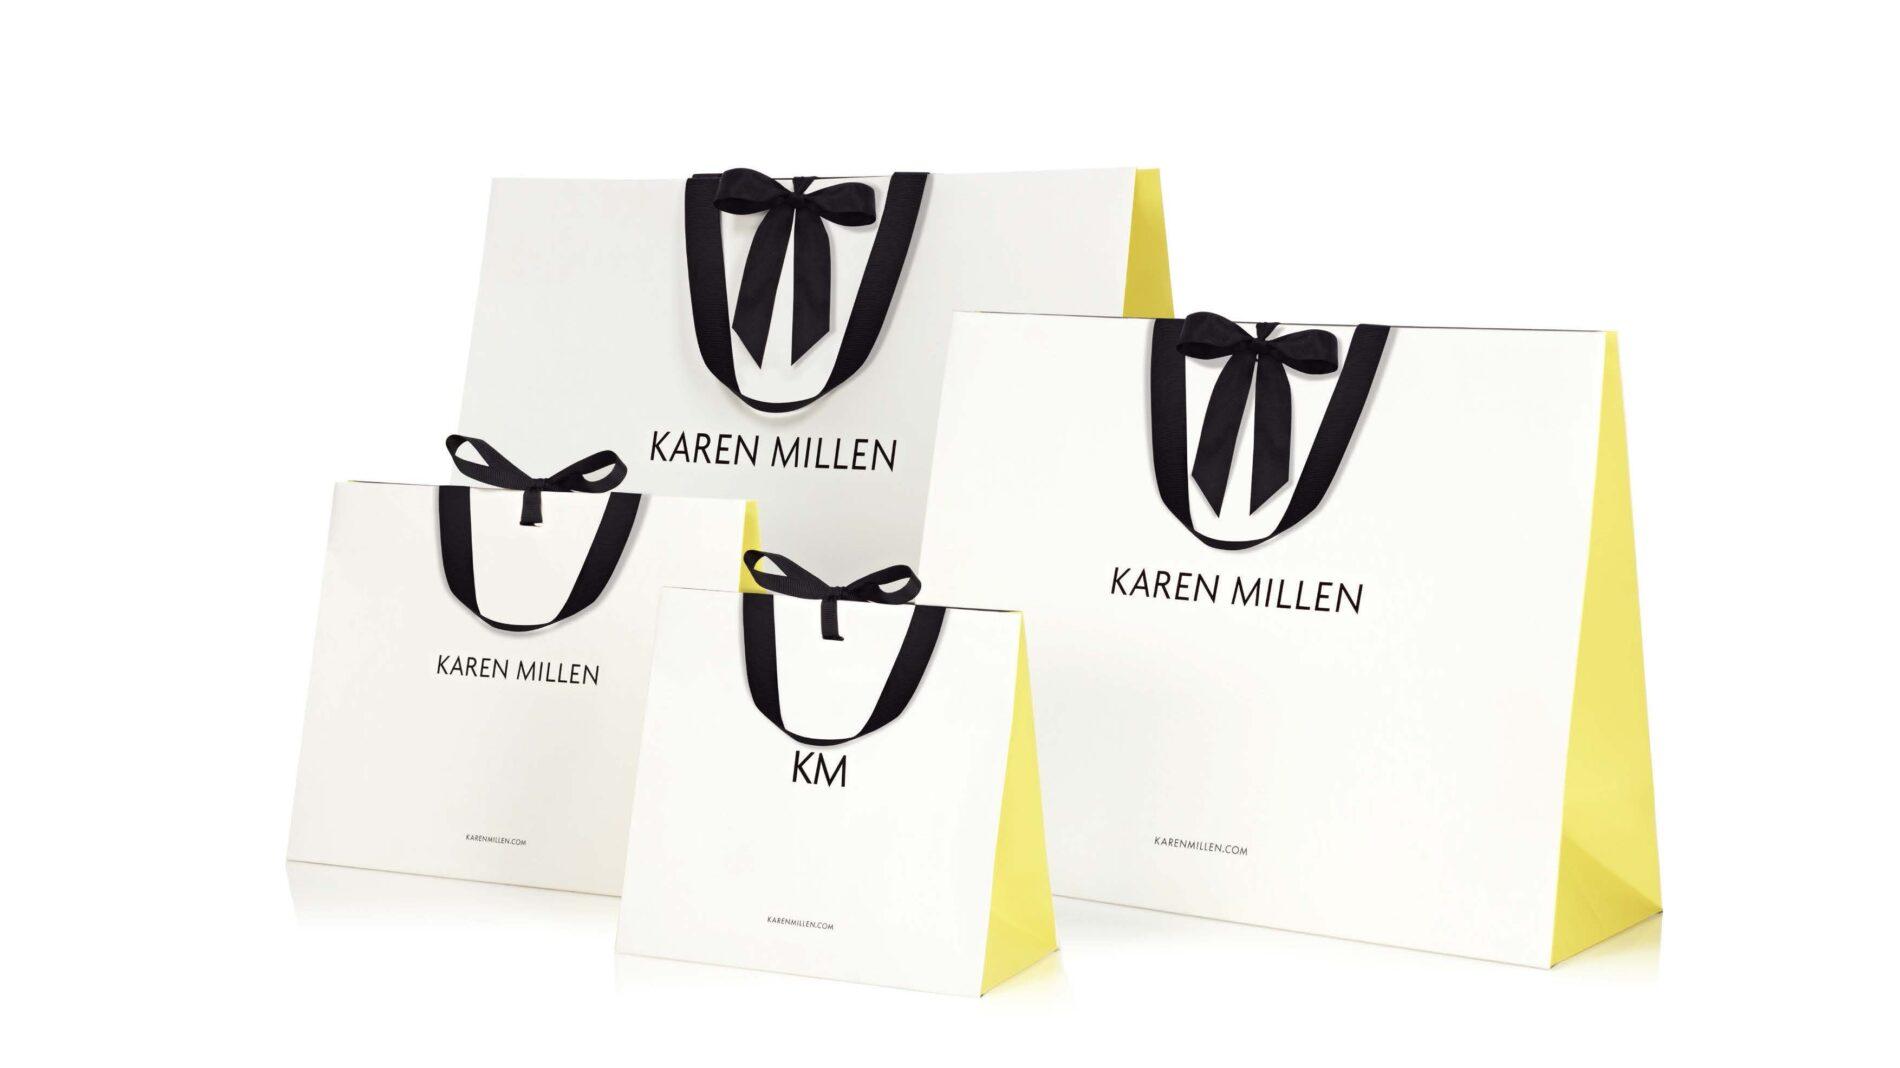 4 Karen millen shopping bags of different sizes